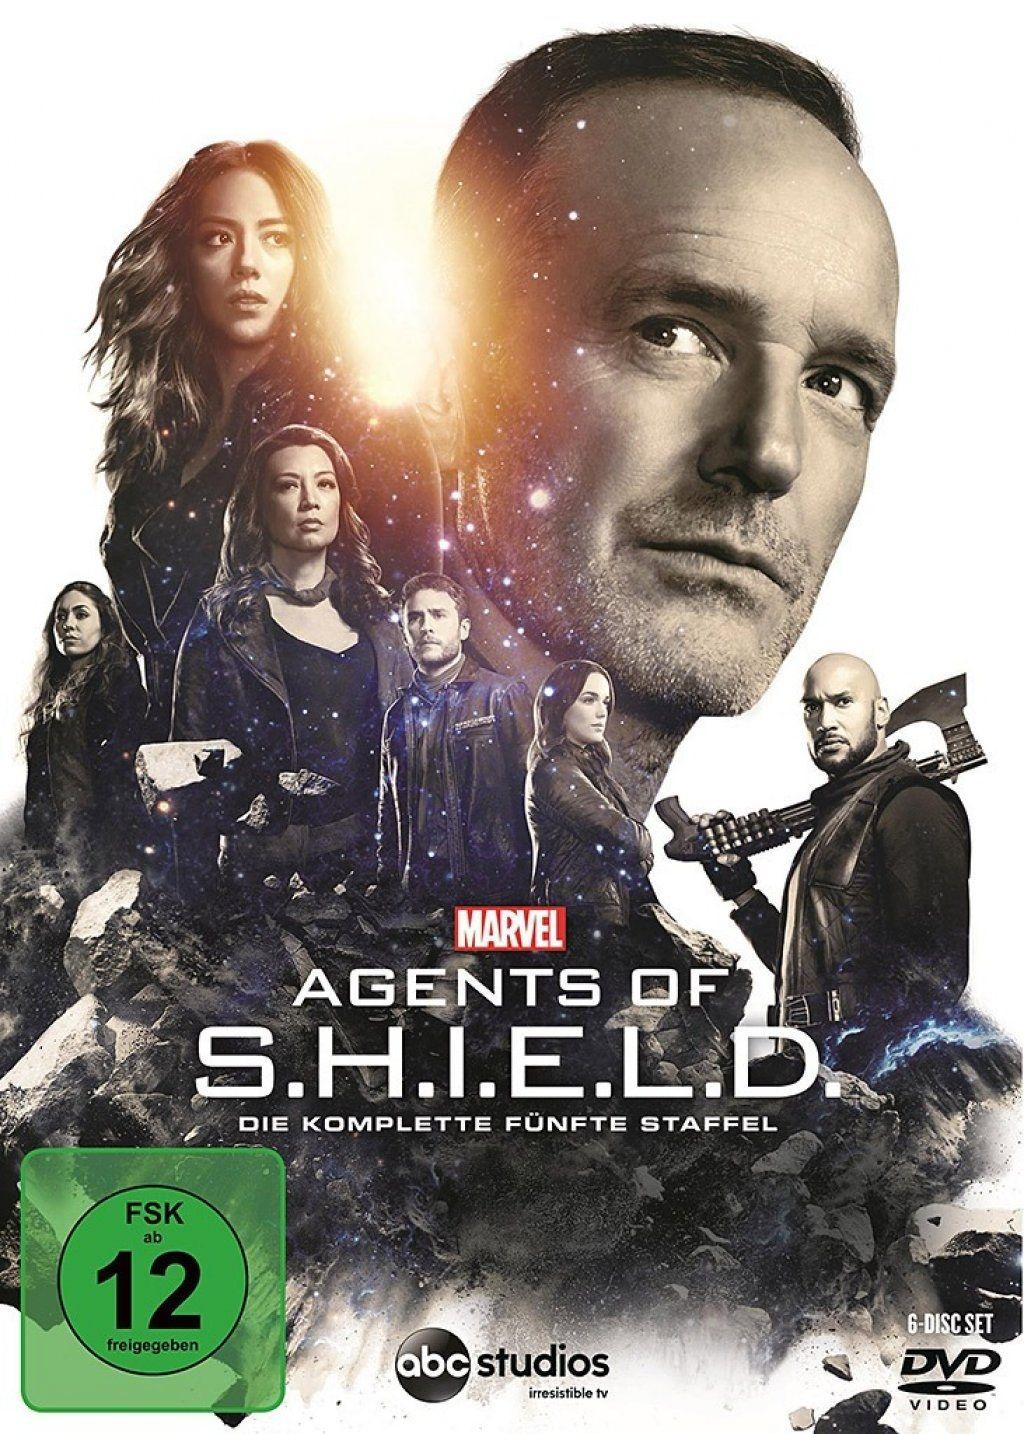 Marvel's Agents of S.H.I.E.L.D. - Die komplette fünfte Staffel (6 Discs)